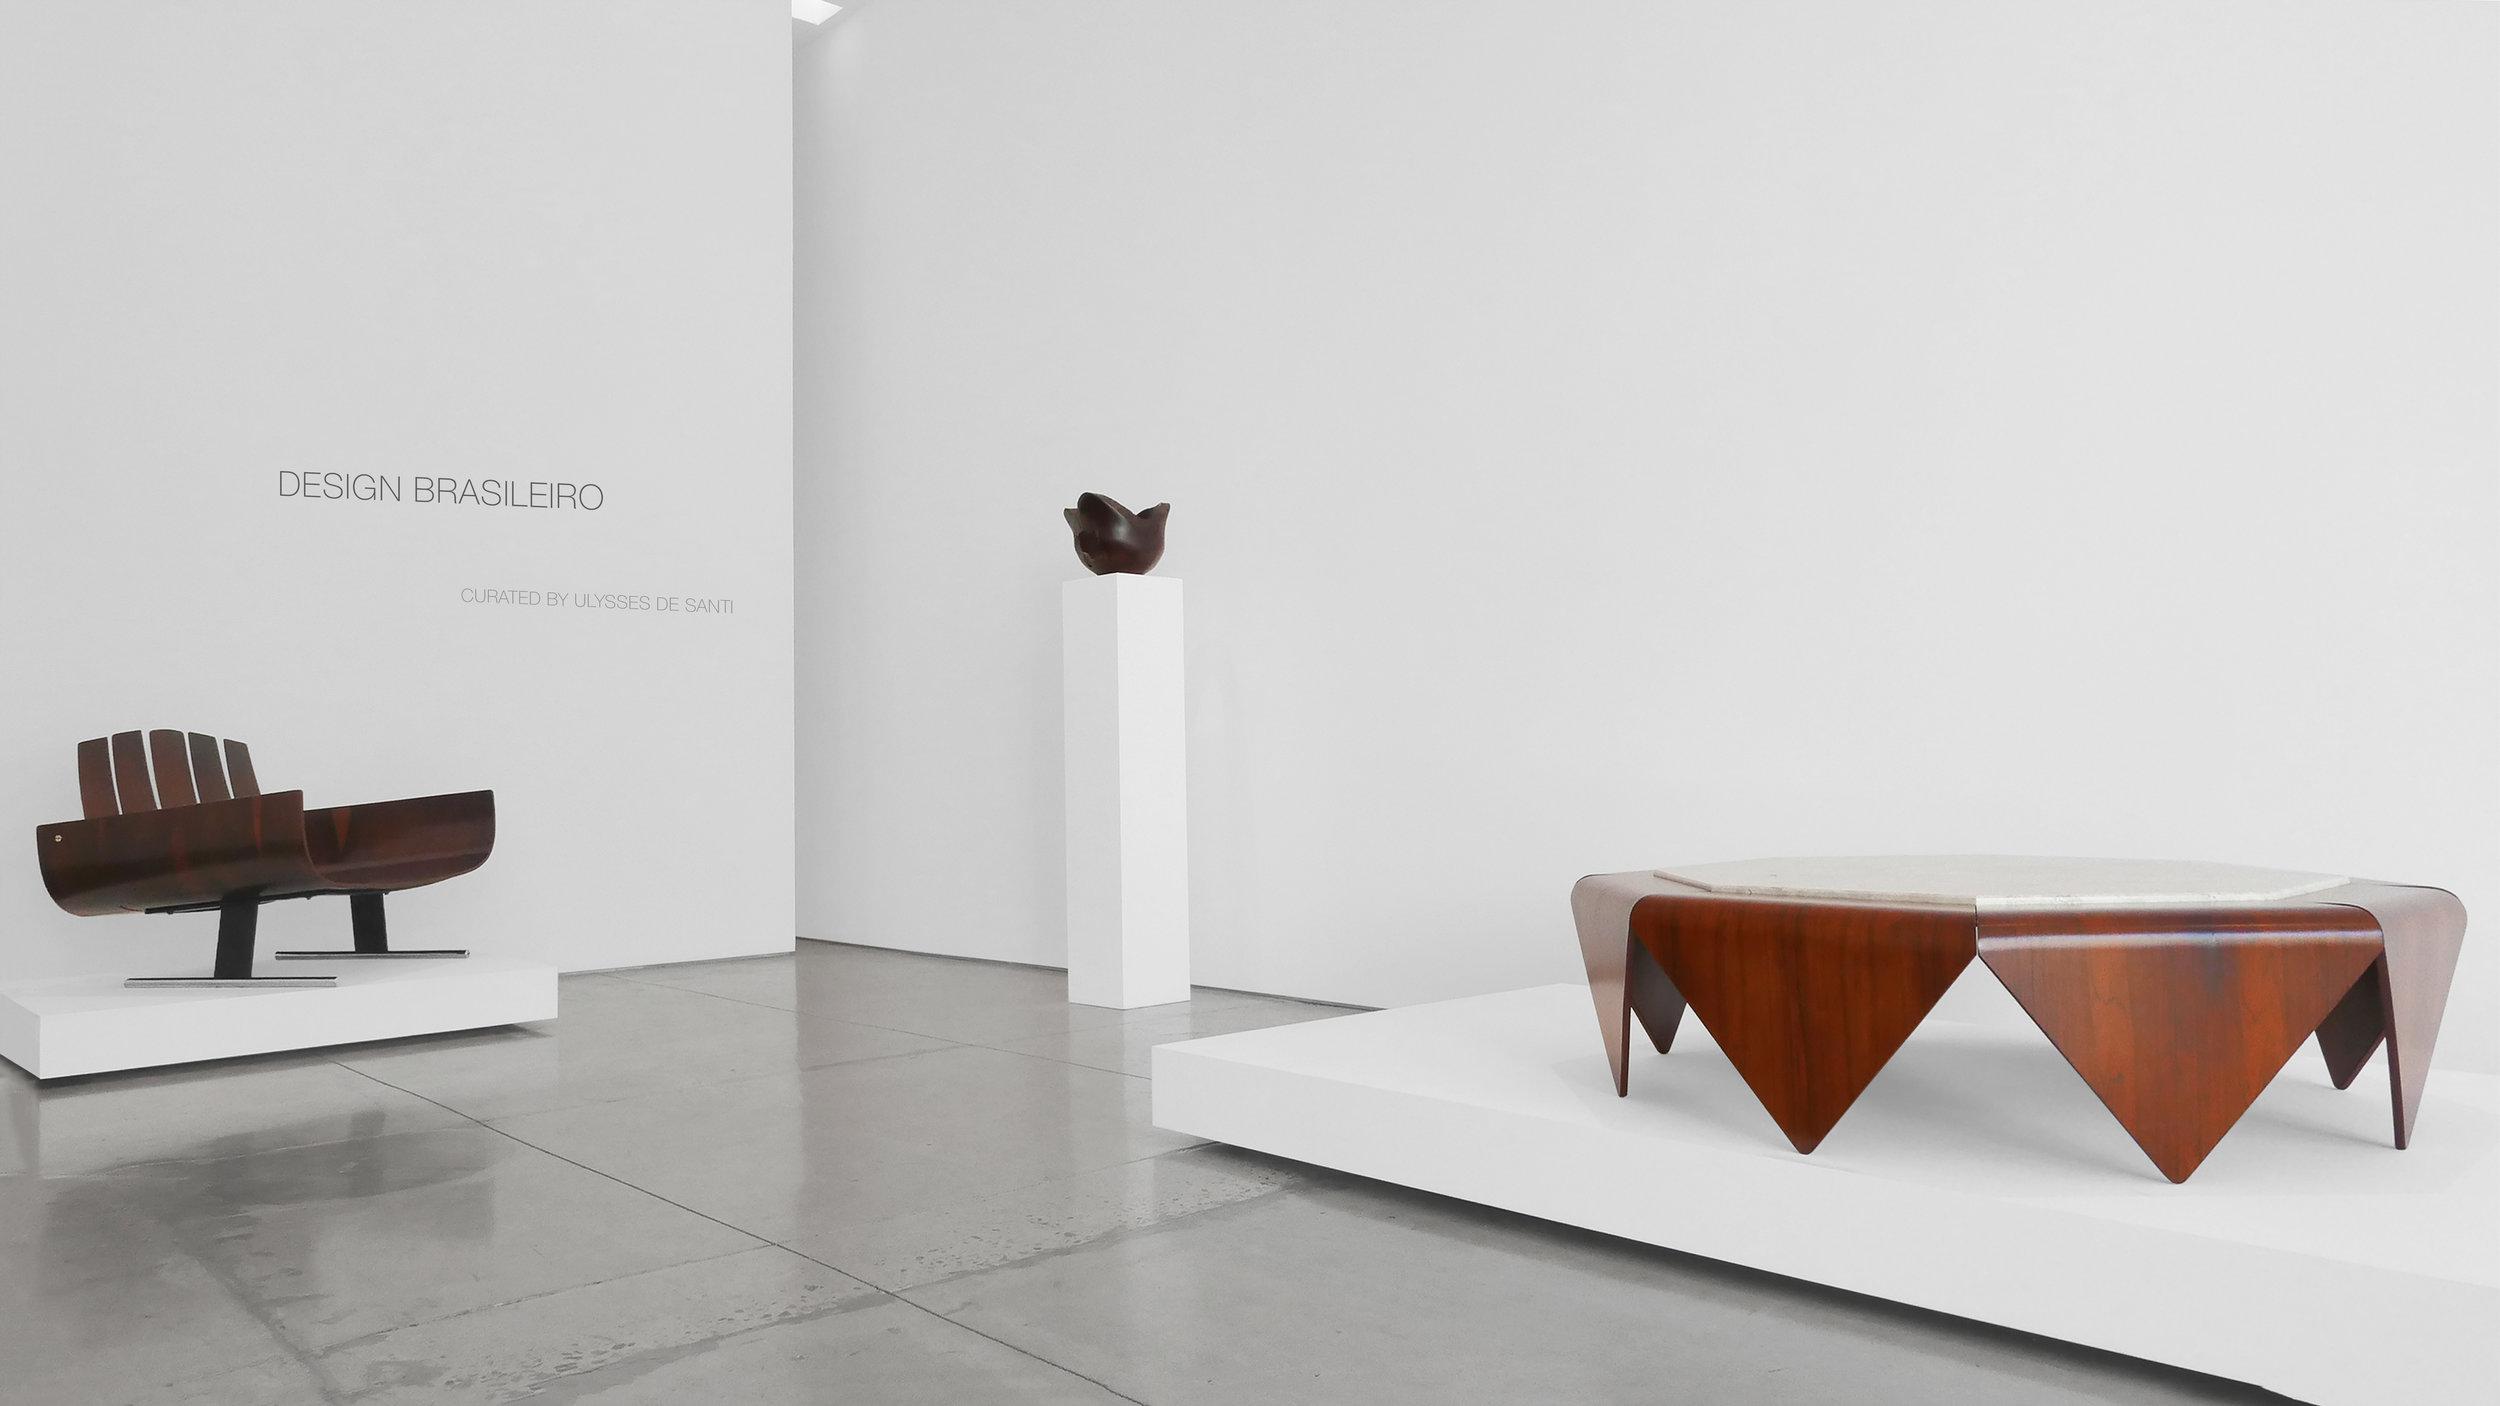 Design Brasileiro, Curated by Ulysses de Santi, Peter Blake Gallery, 2018, Installation View_4.jpg